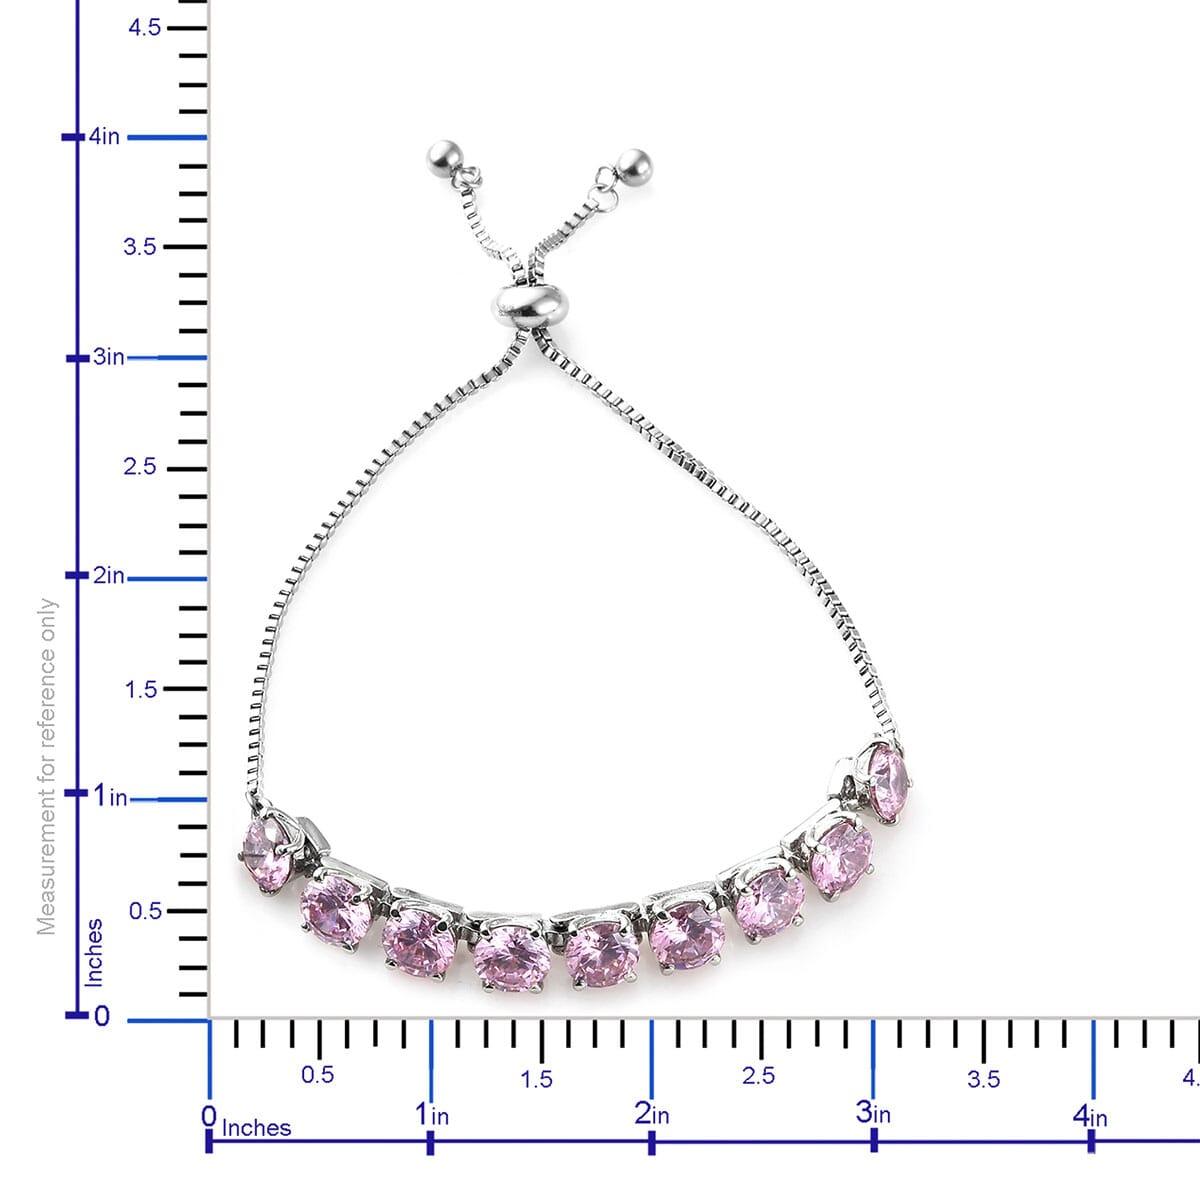 Steel-Cubic-Zirconia-CZ-Orange-Elegant-Adjustable-Bolo-Bracelet-for-Women-Ct-21 thumbnail 25